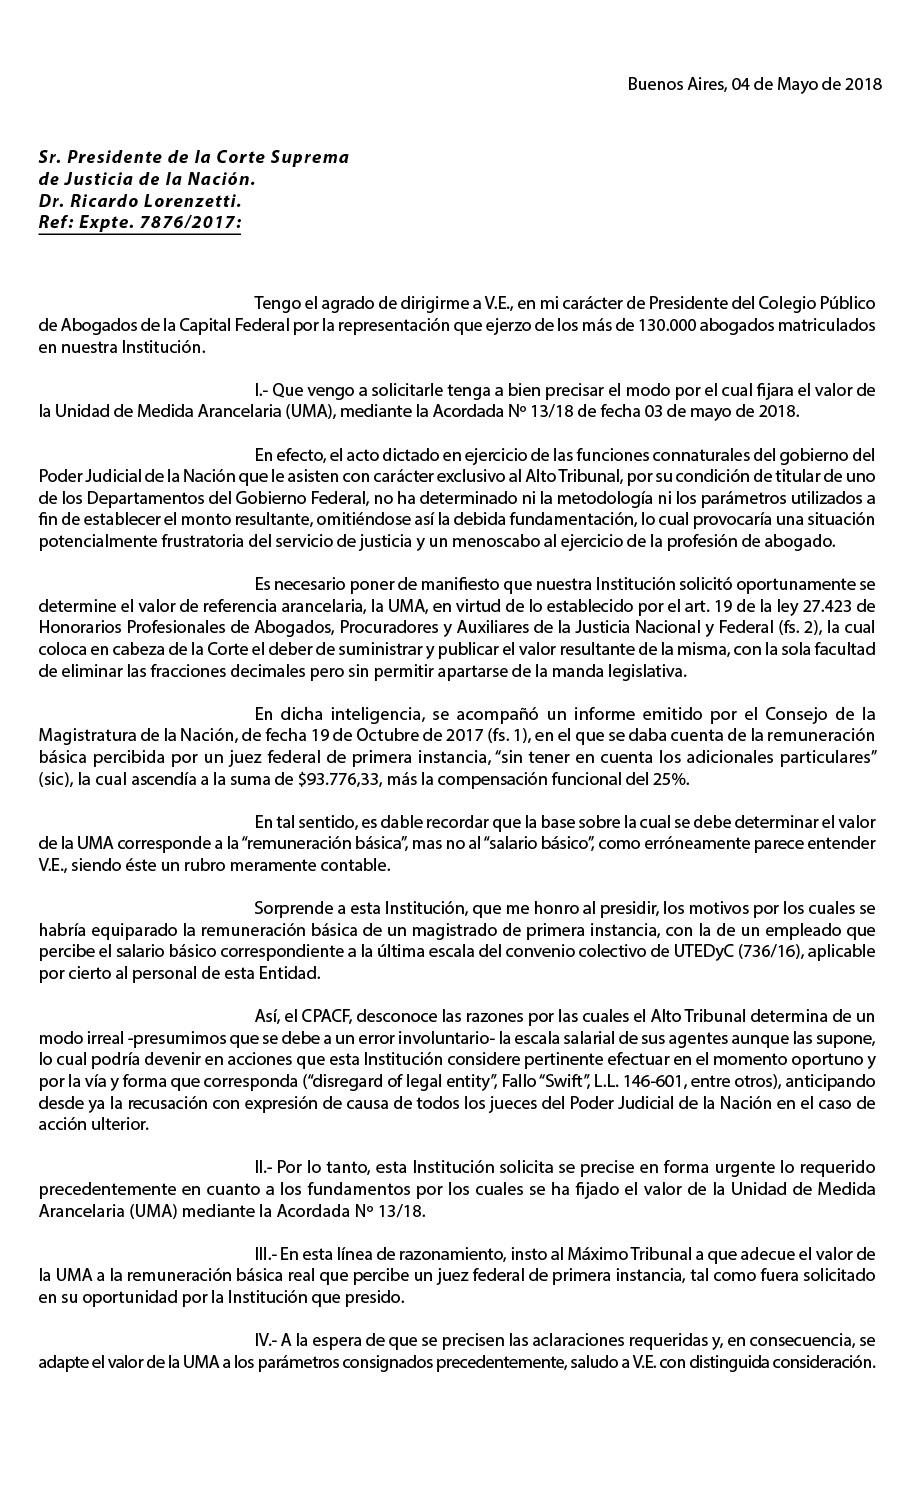 Aclaratoria-Acordada-13-18 (1)